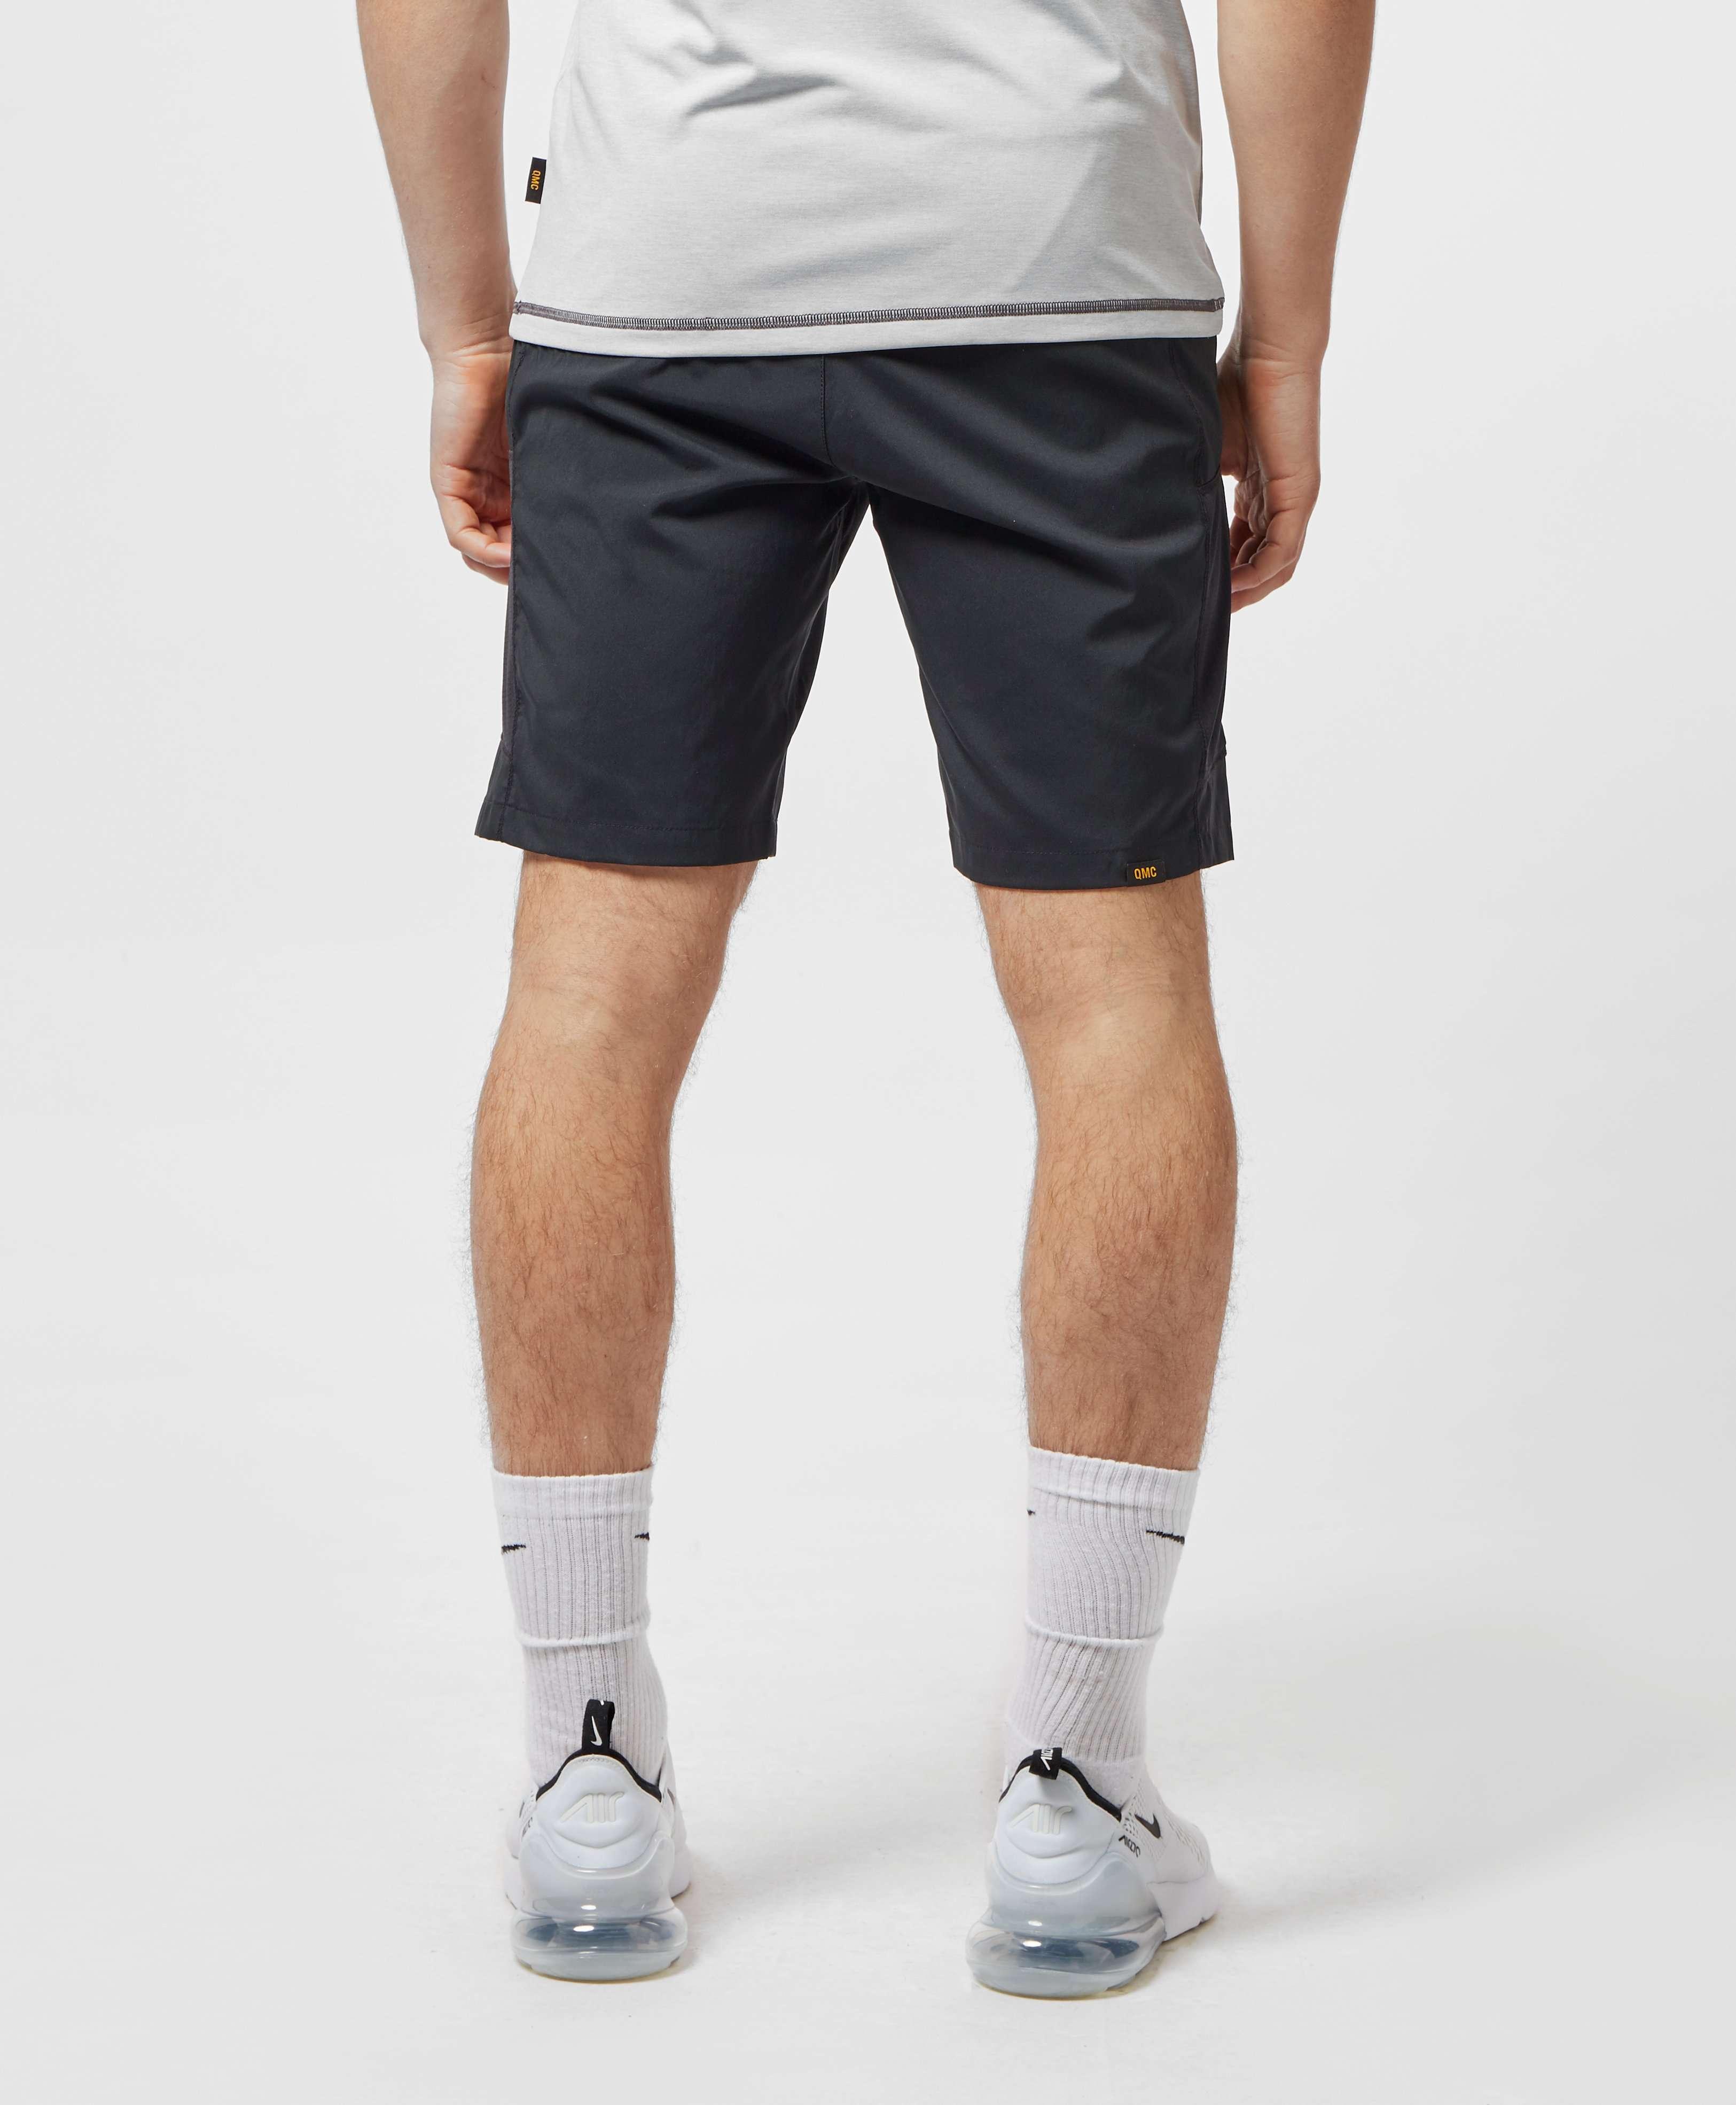 Jack Wolfskin Poly Tech Mesh Shorts